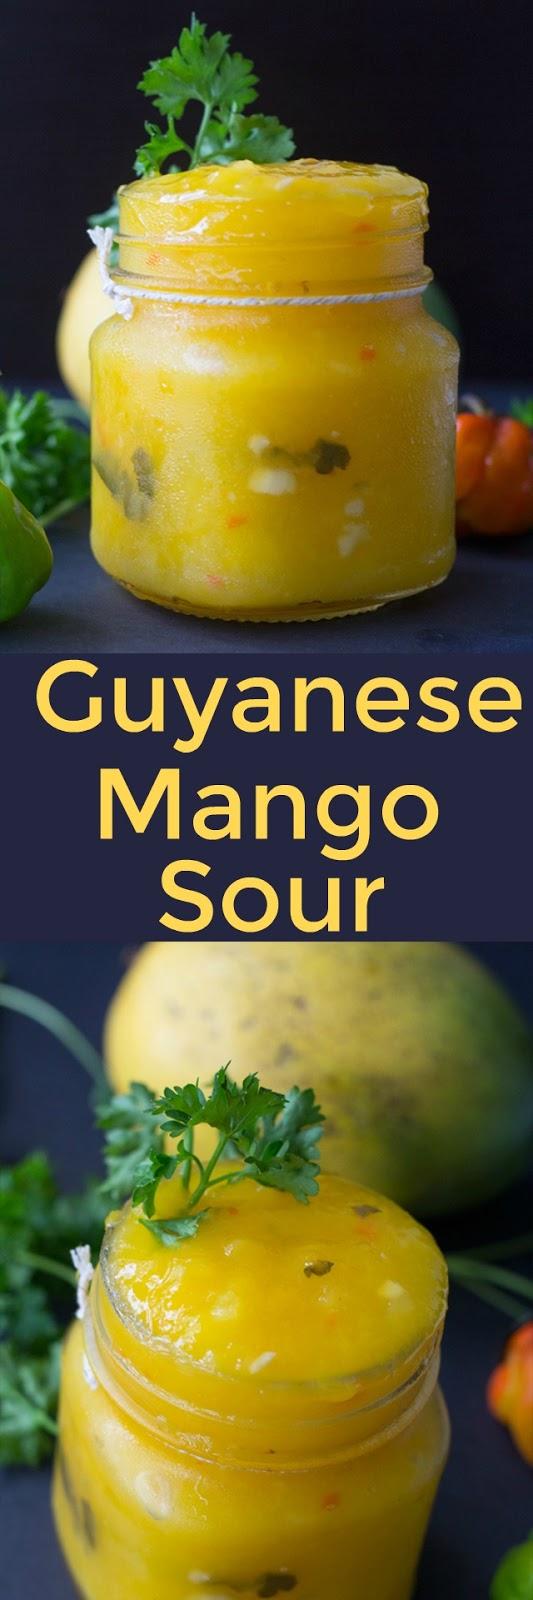 Guyanese Mango Chutney